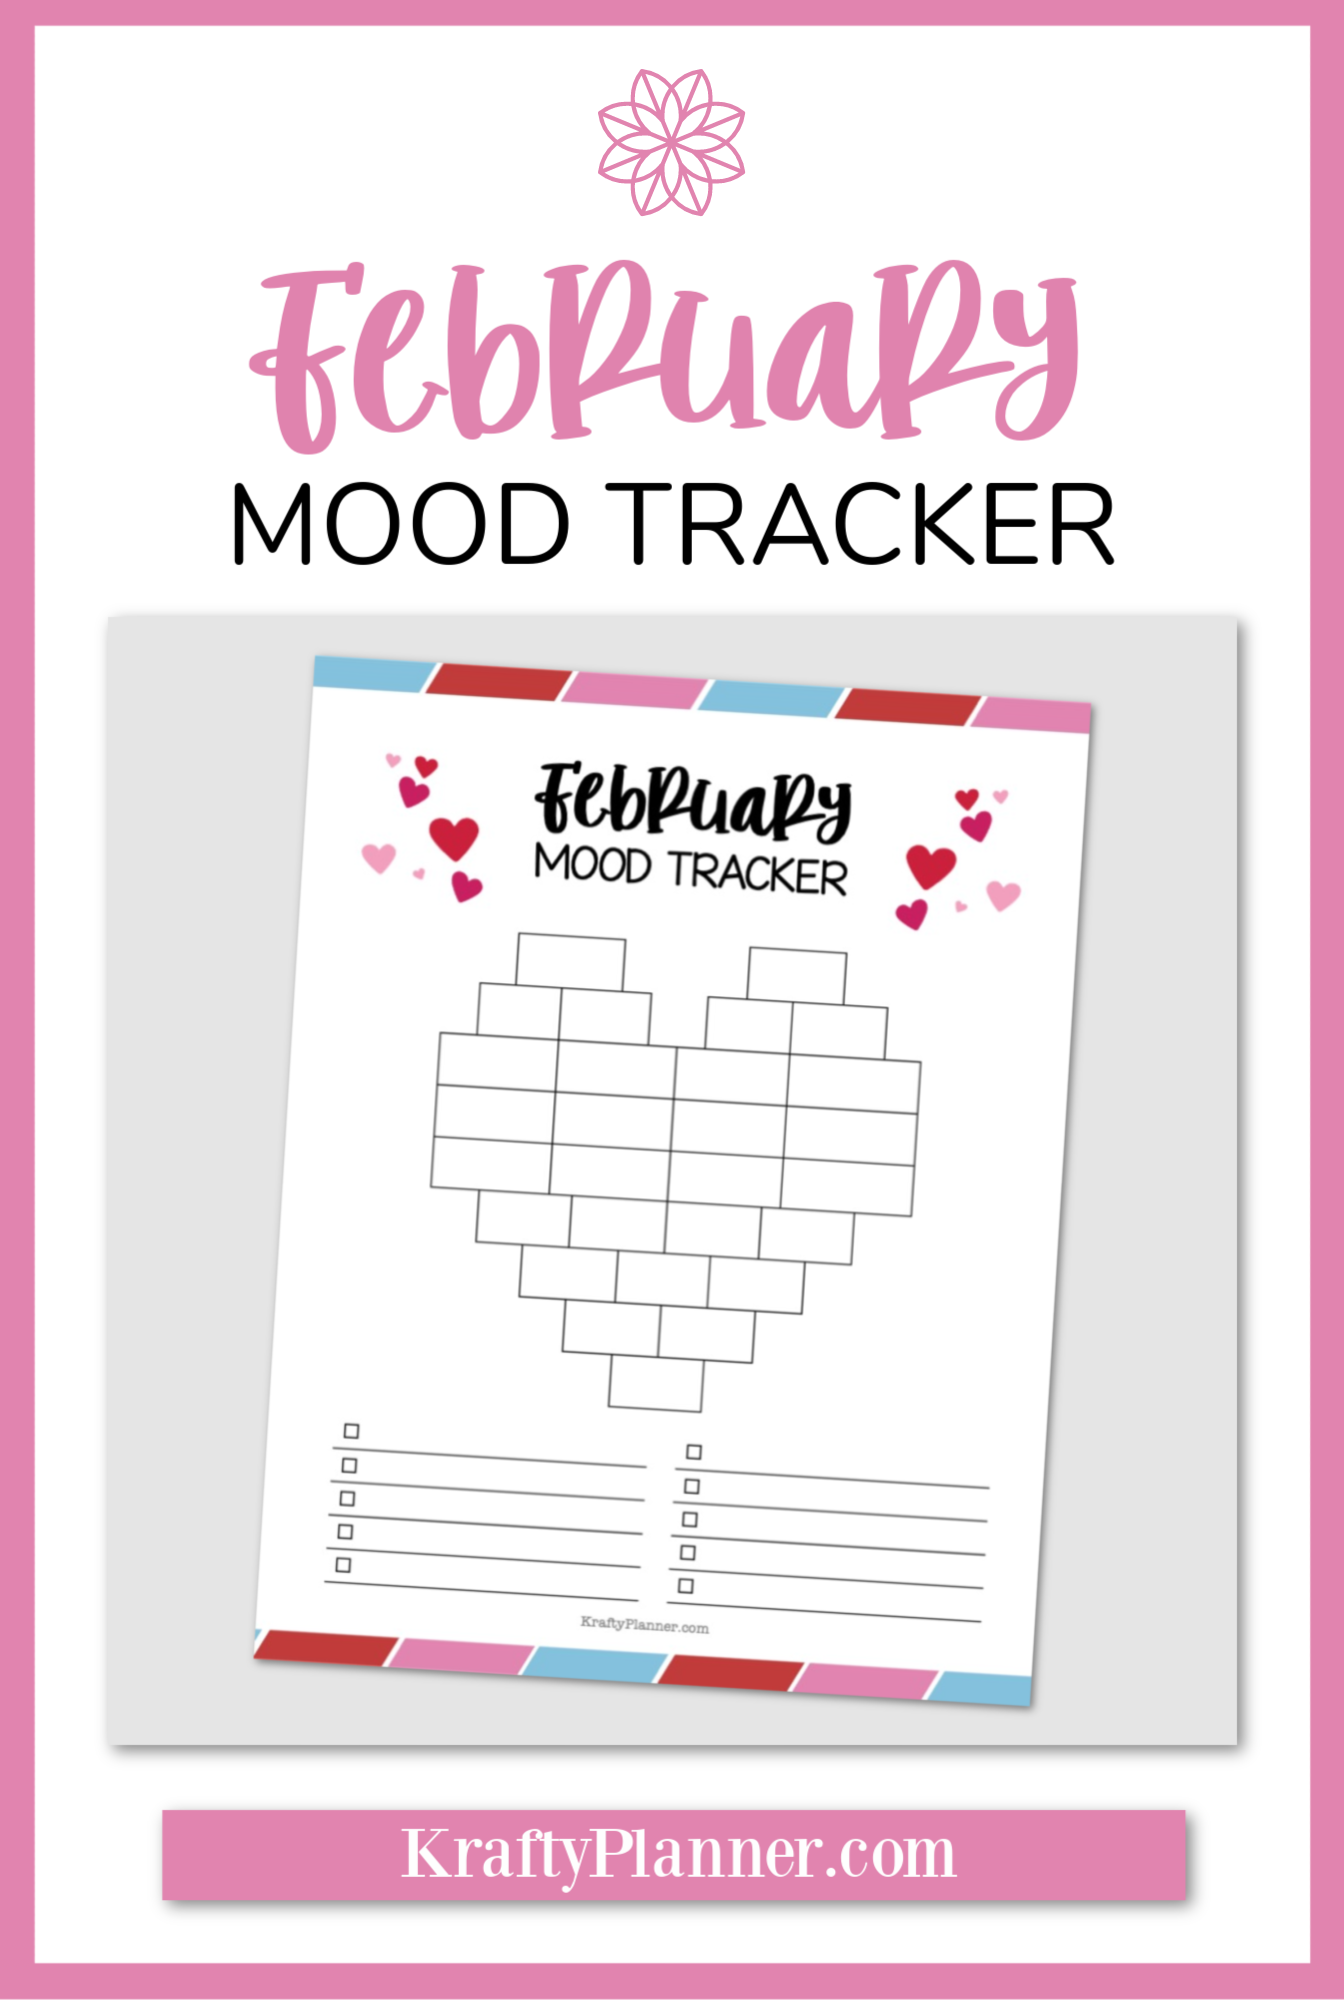 February Mood Tracker {Free Printable} PIN 2.png